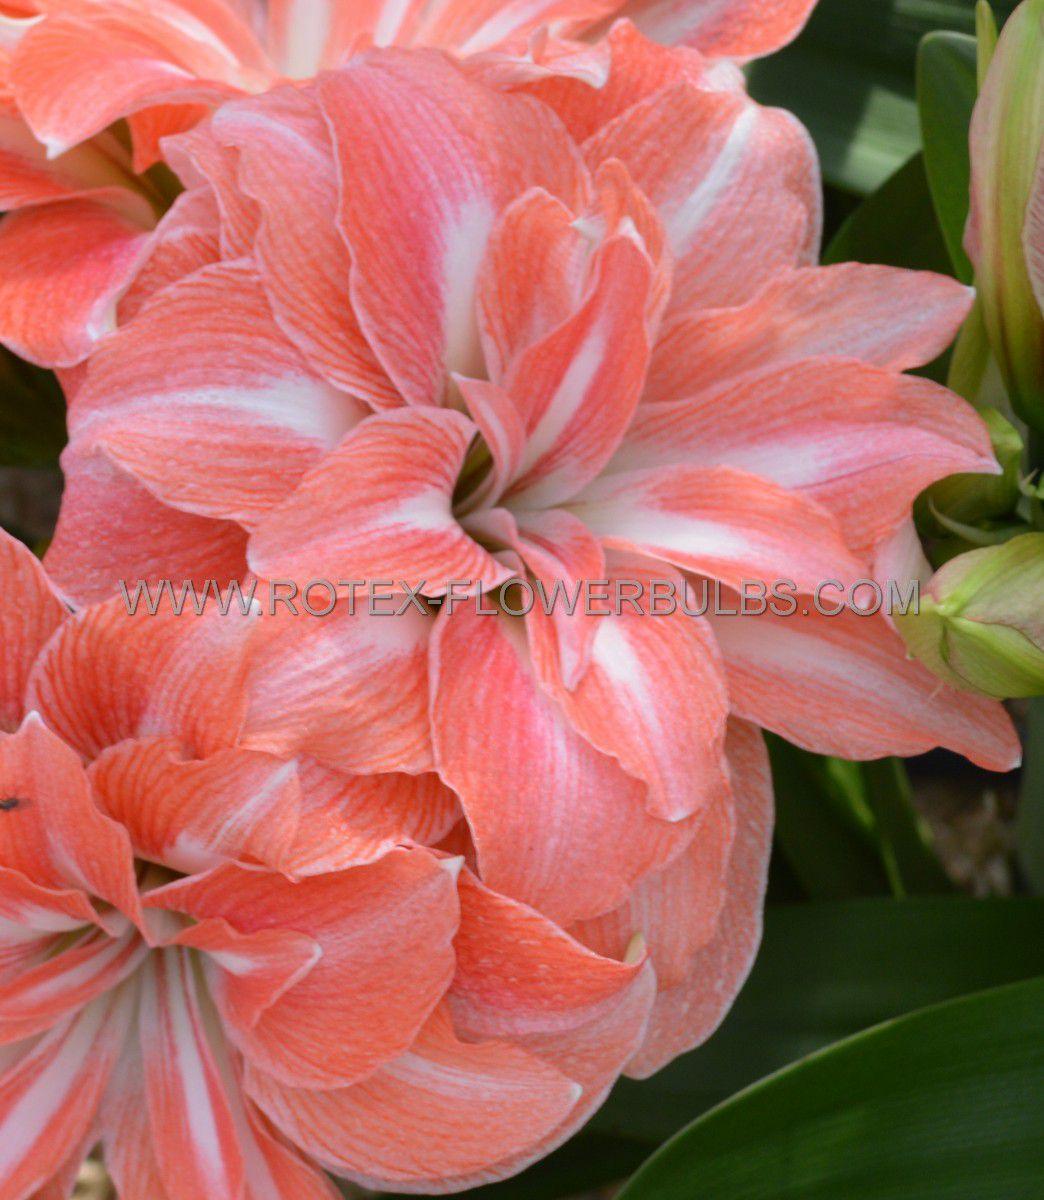 hippeastrum amaryllis double flowering lady jane 3436 cm 12 pwooden crate